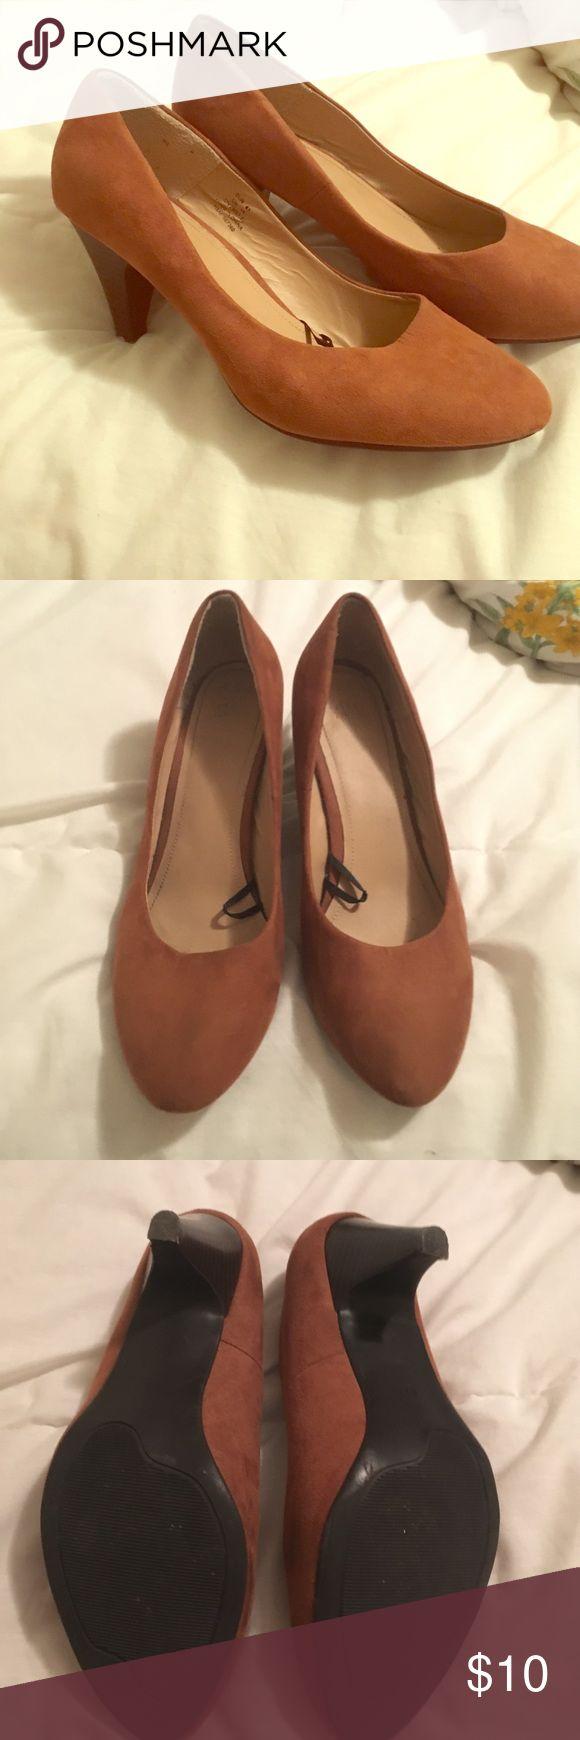 H&M heels Camel-colored kitten heels, in great condition H&M Shoes Heels